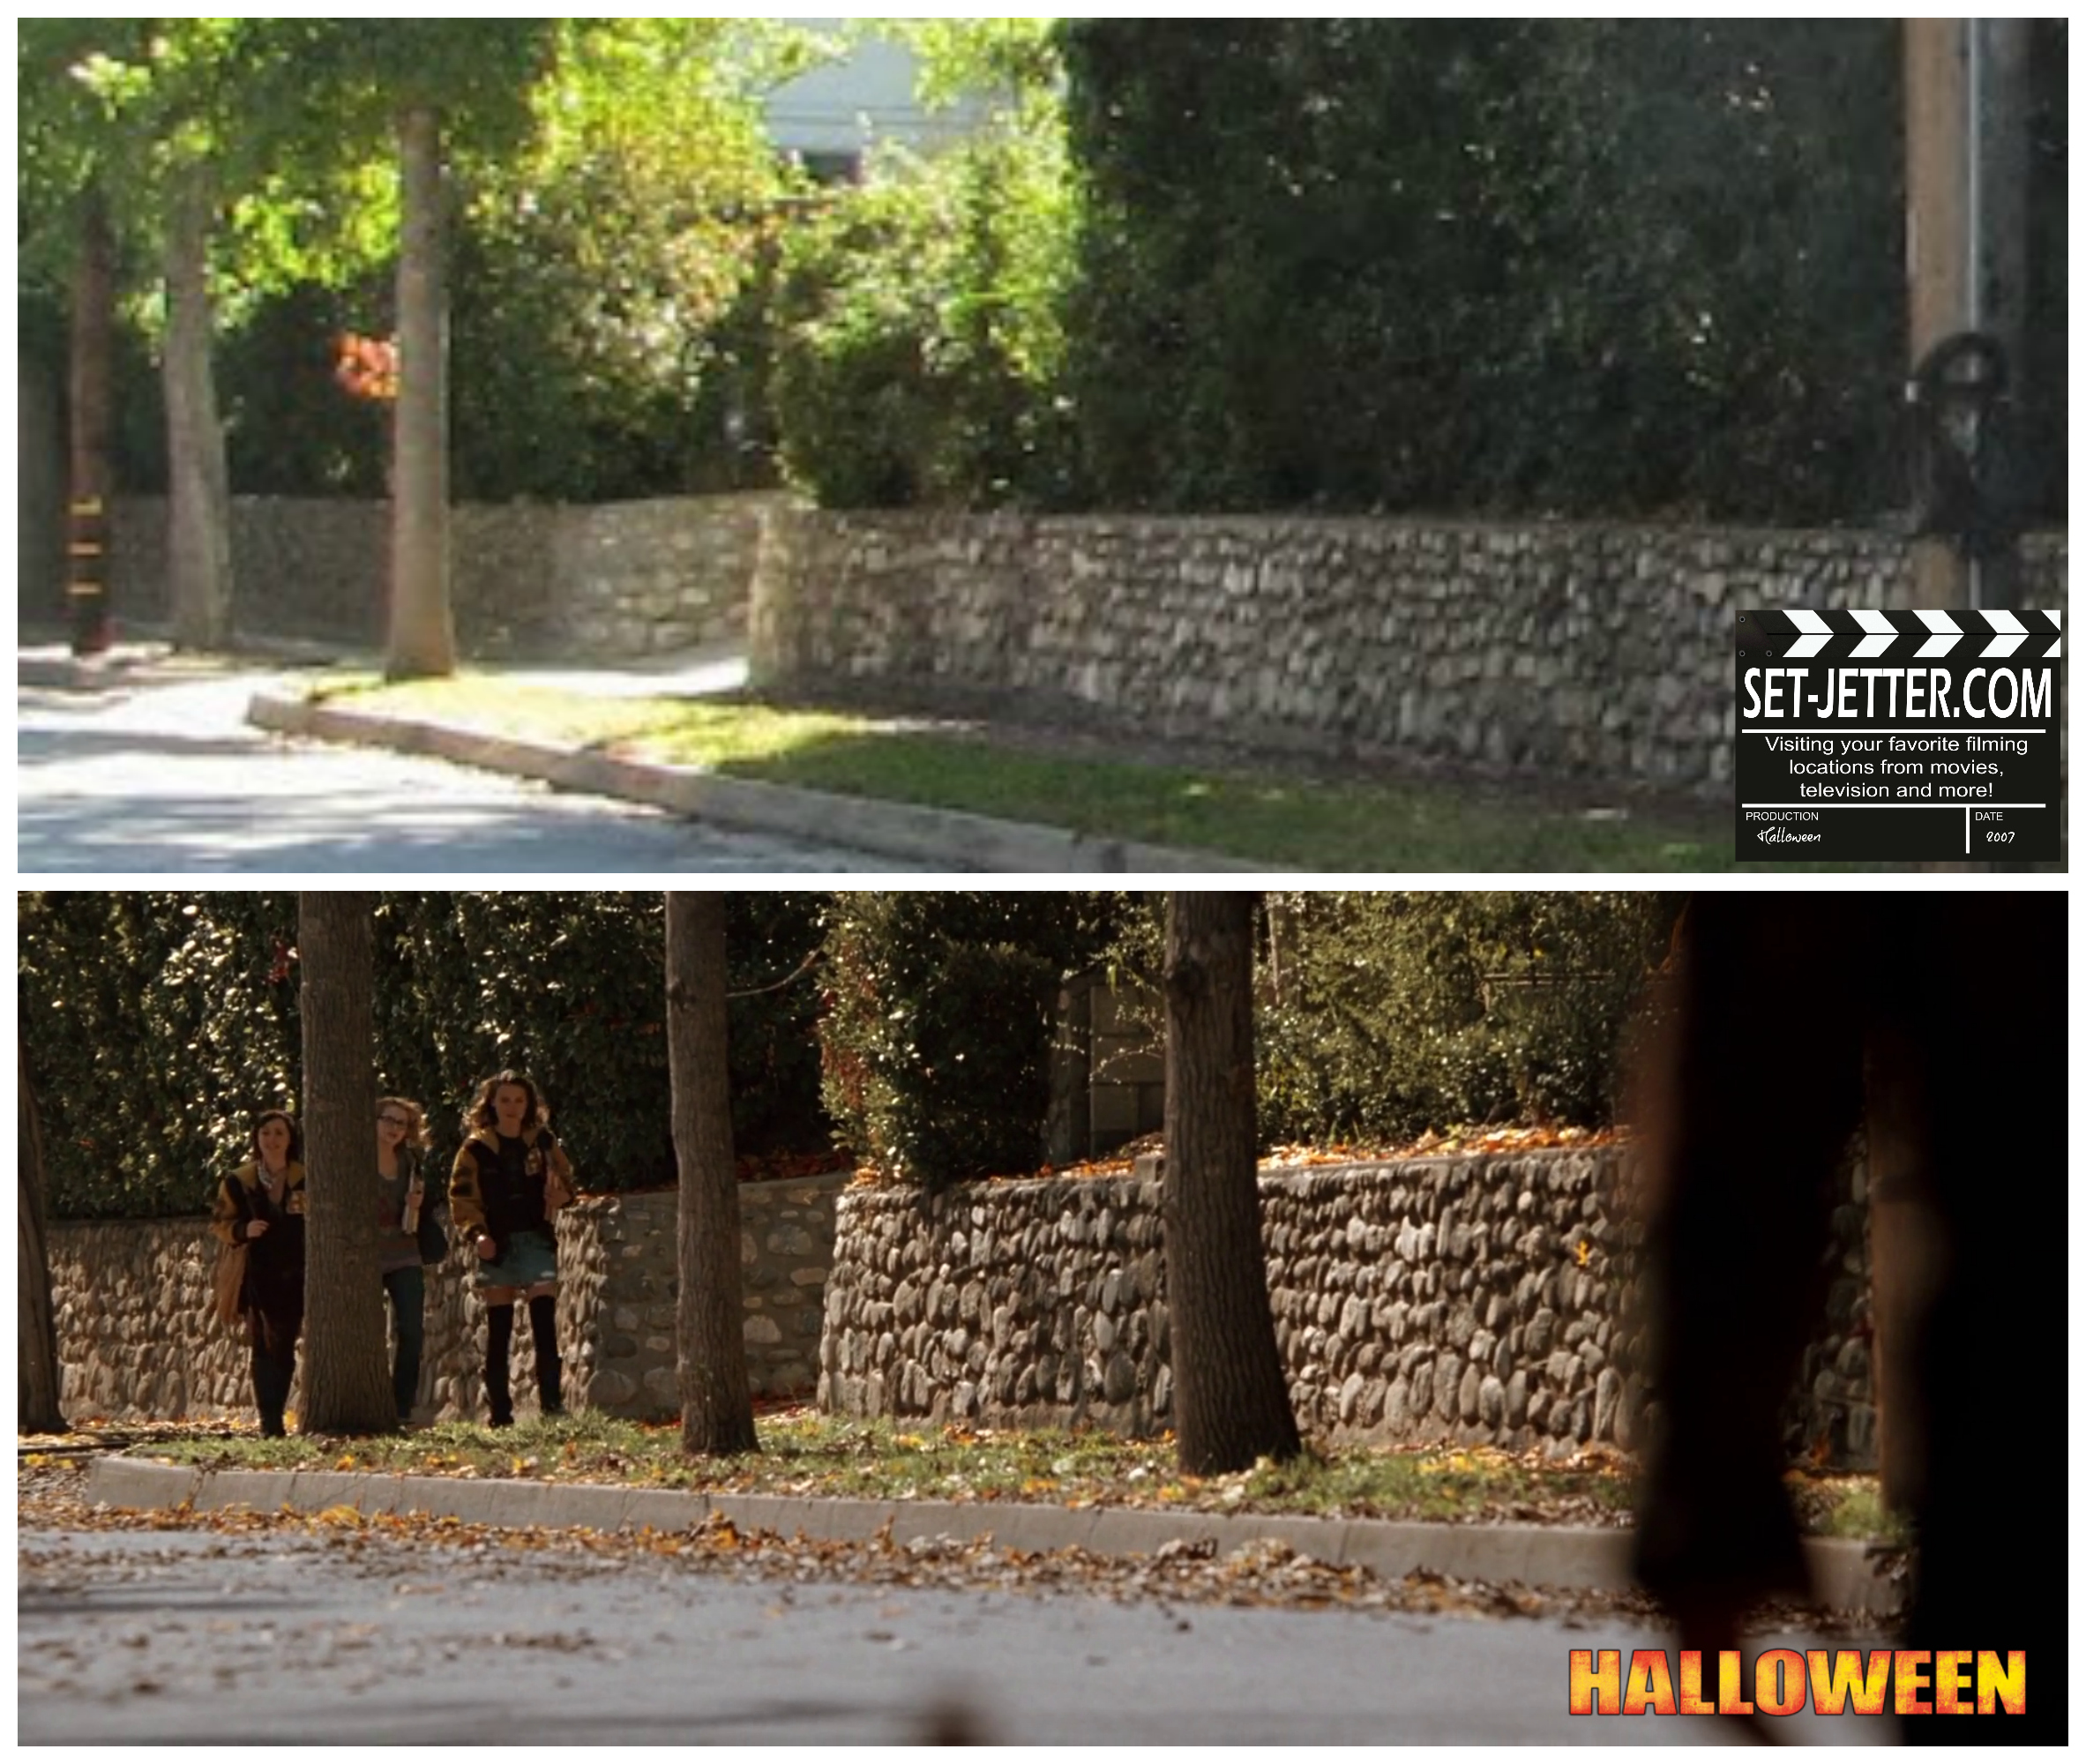 Halloween 2007 comparison 45.jpg